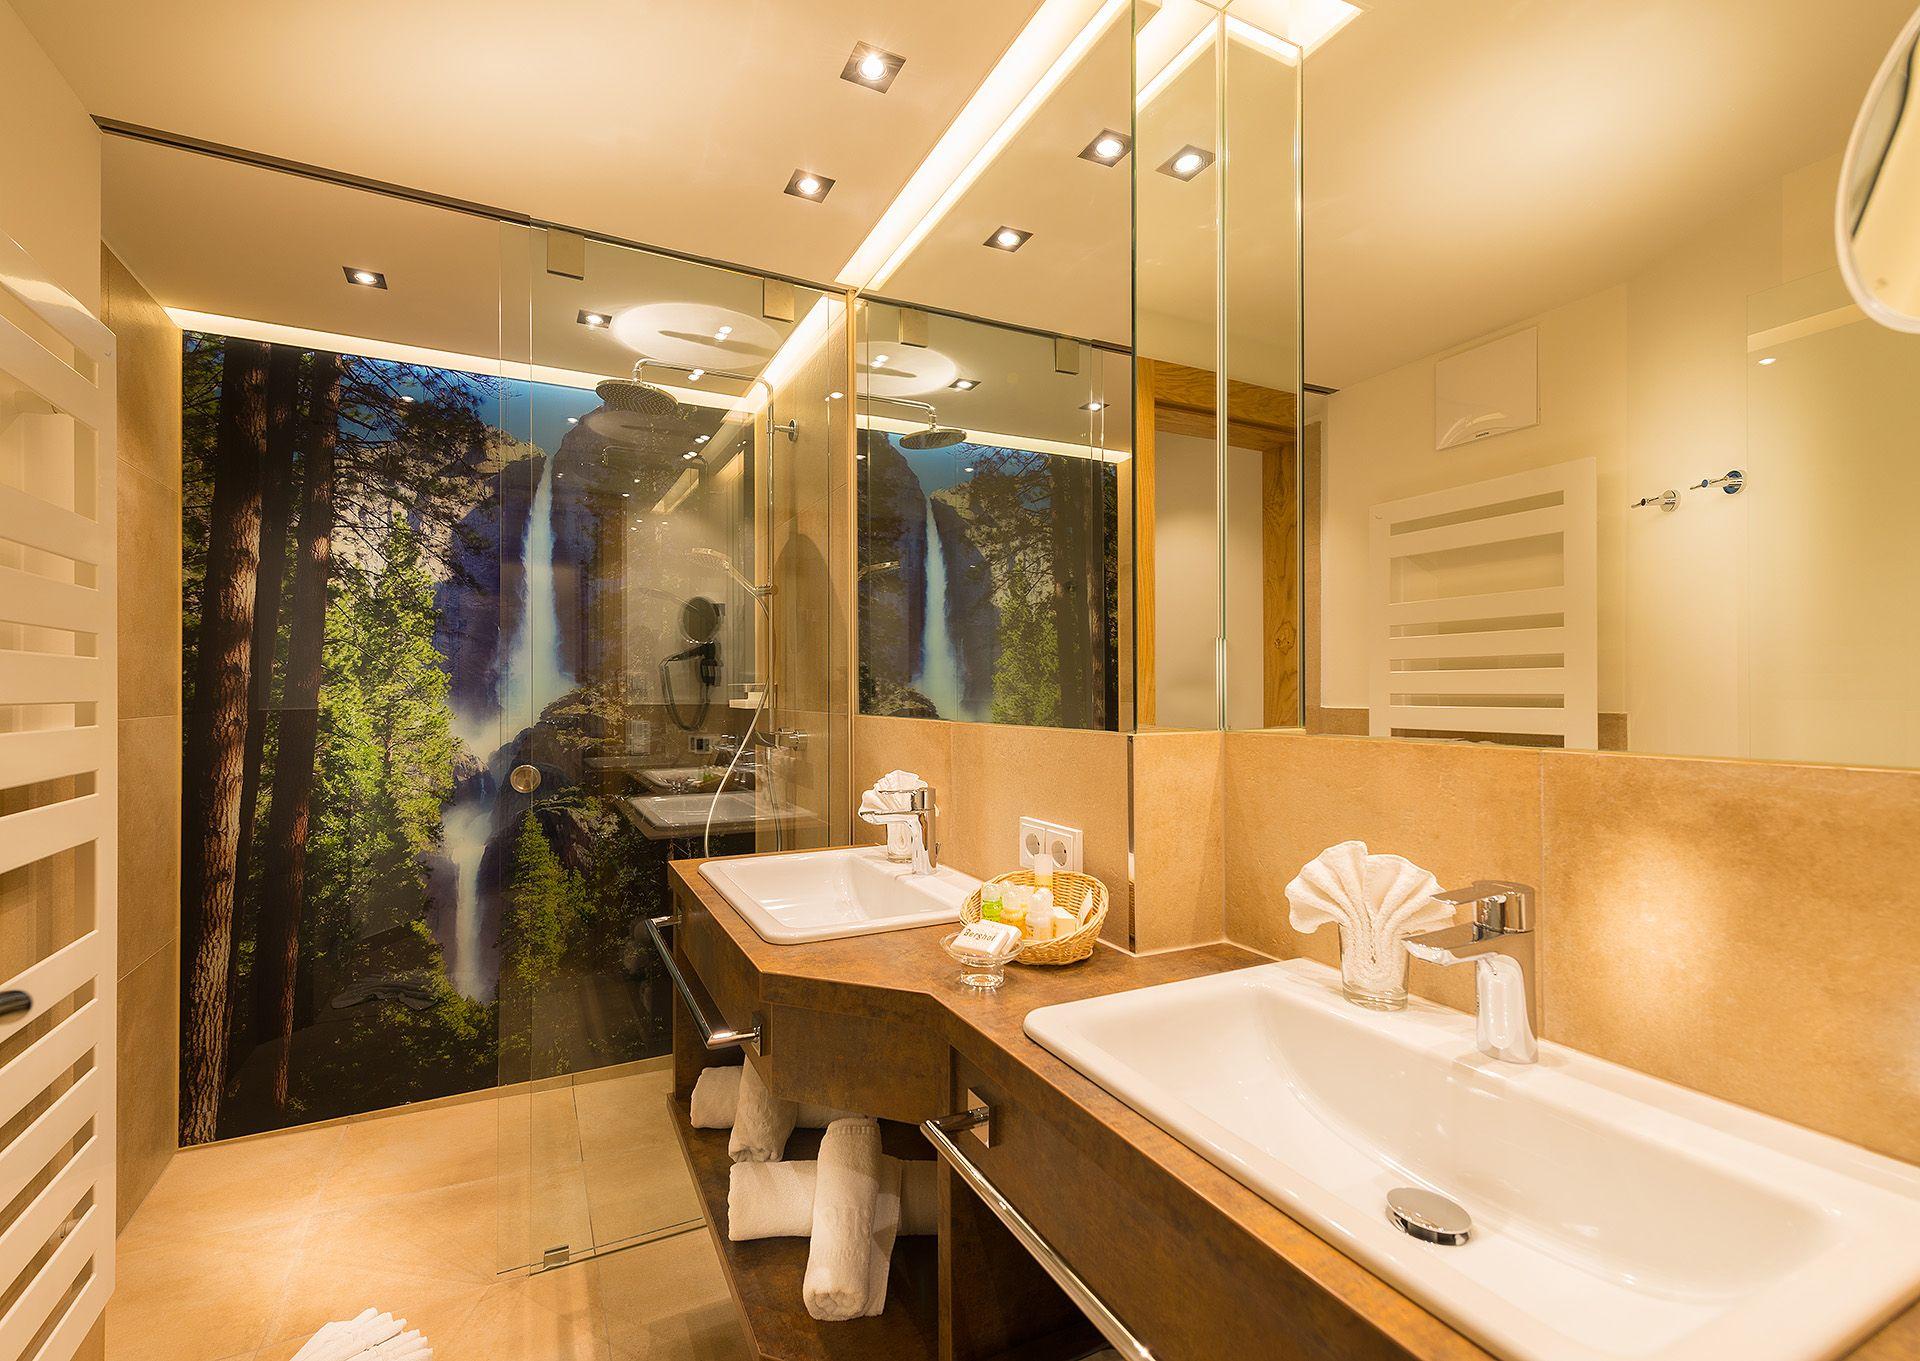 Badezimmer Hotel ~ Neue berghof suiten badezimmer verwöhnhotel berghof 4 sterne